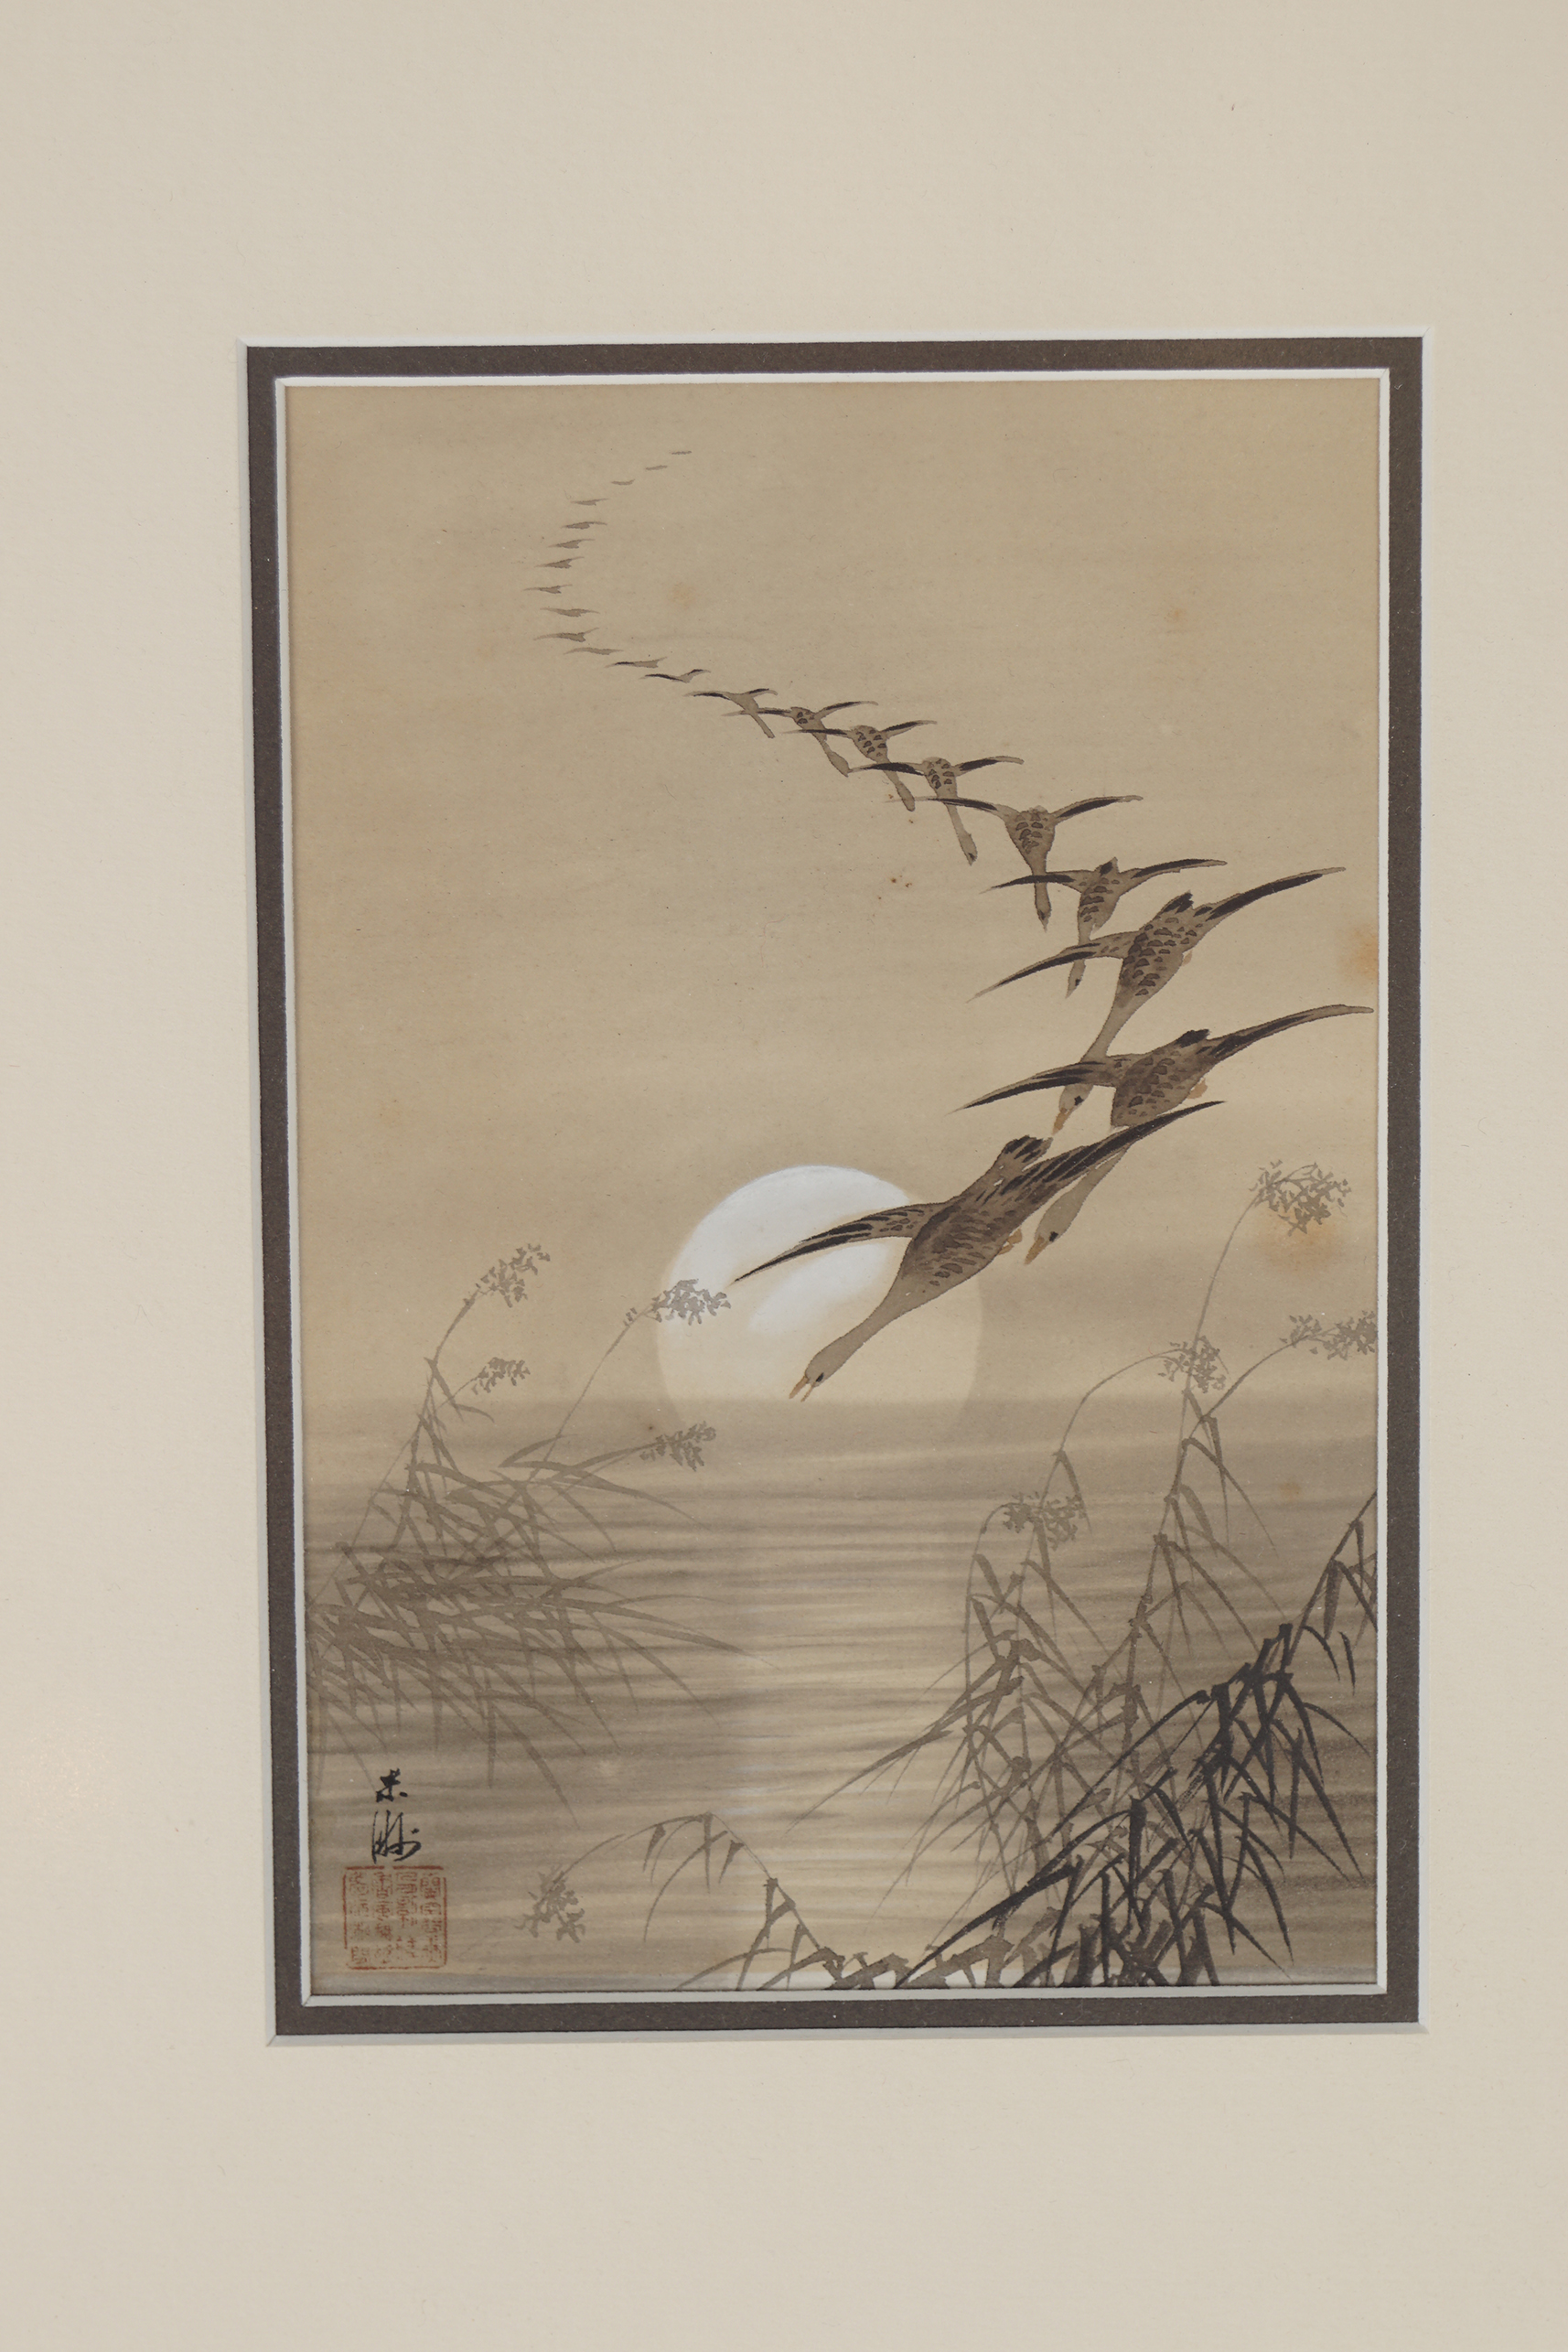 PAIR OF JAPANESE WOODBLOCK PRINTS - Image 3 of 3